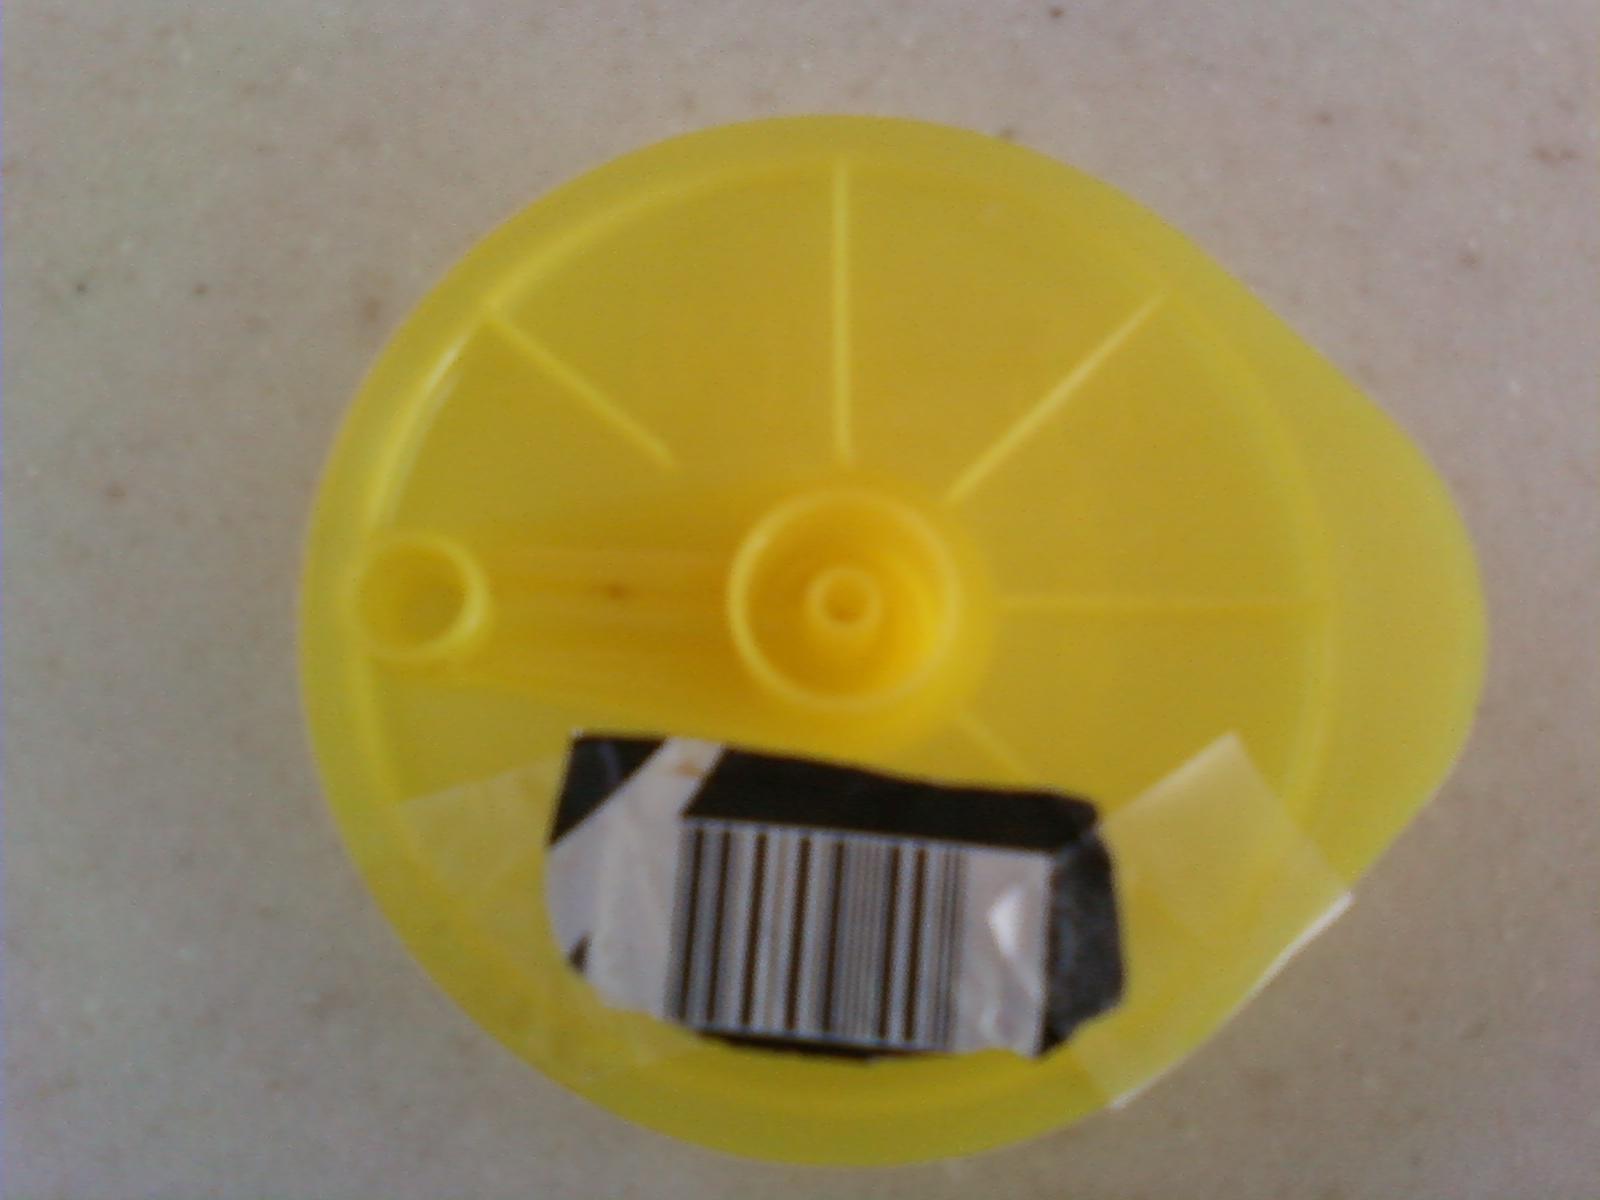 idea tassimo hot water dispenser t disc for hot tea conflictedracer 39 s. Black Bedroom Furniture Sets. Home Design Ideas